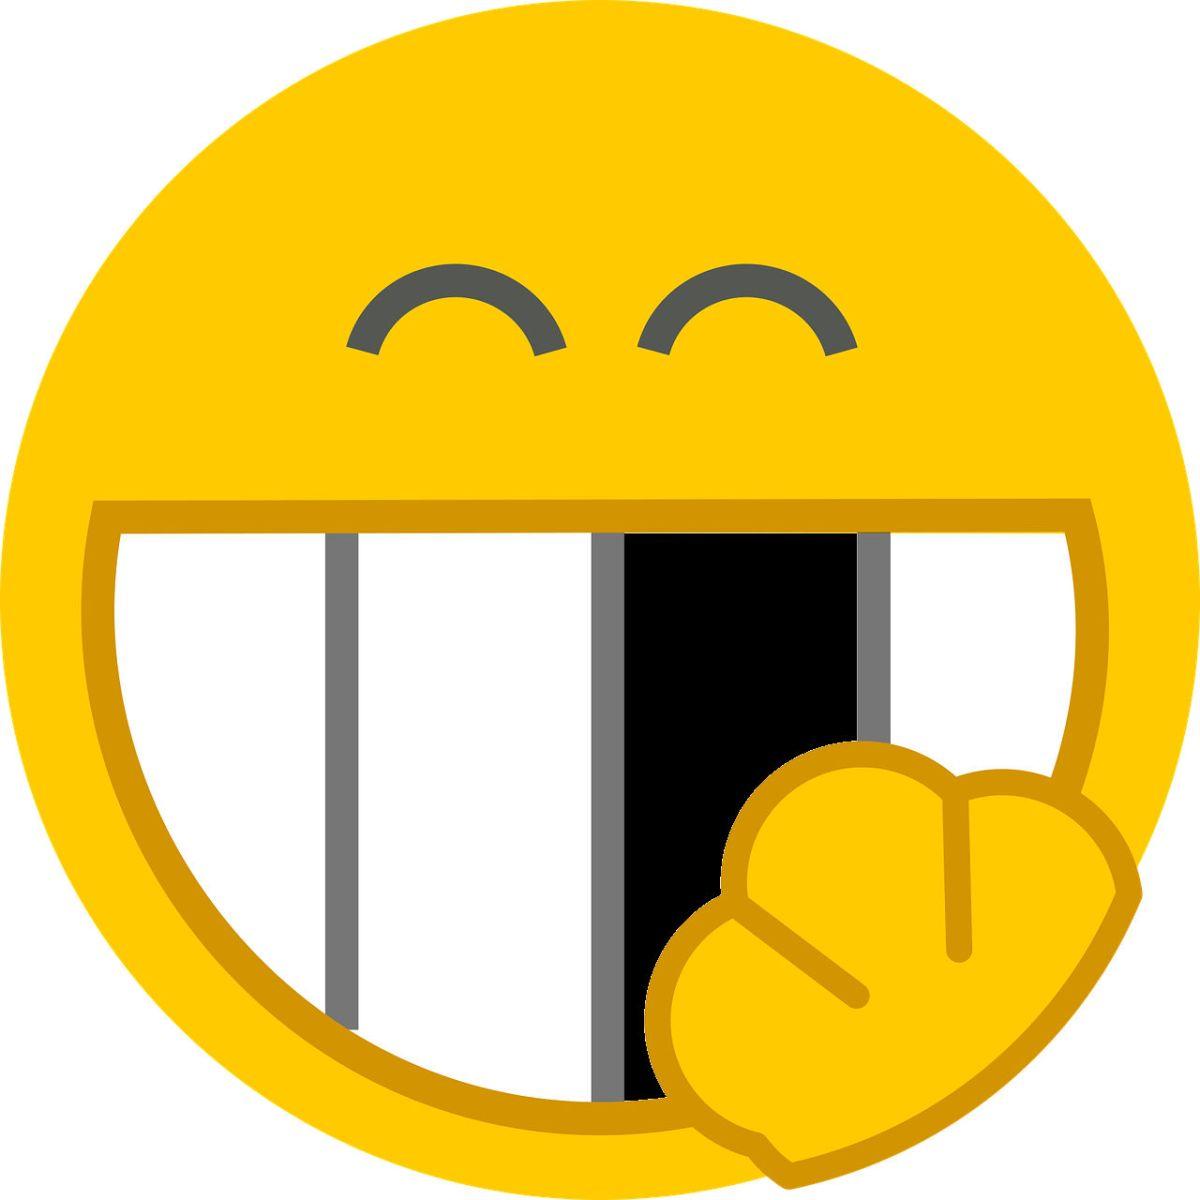 A n image of a smiling emoji. One of its teeth is missing.